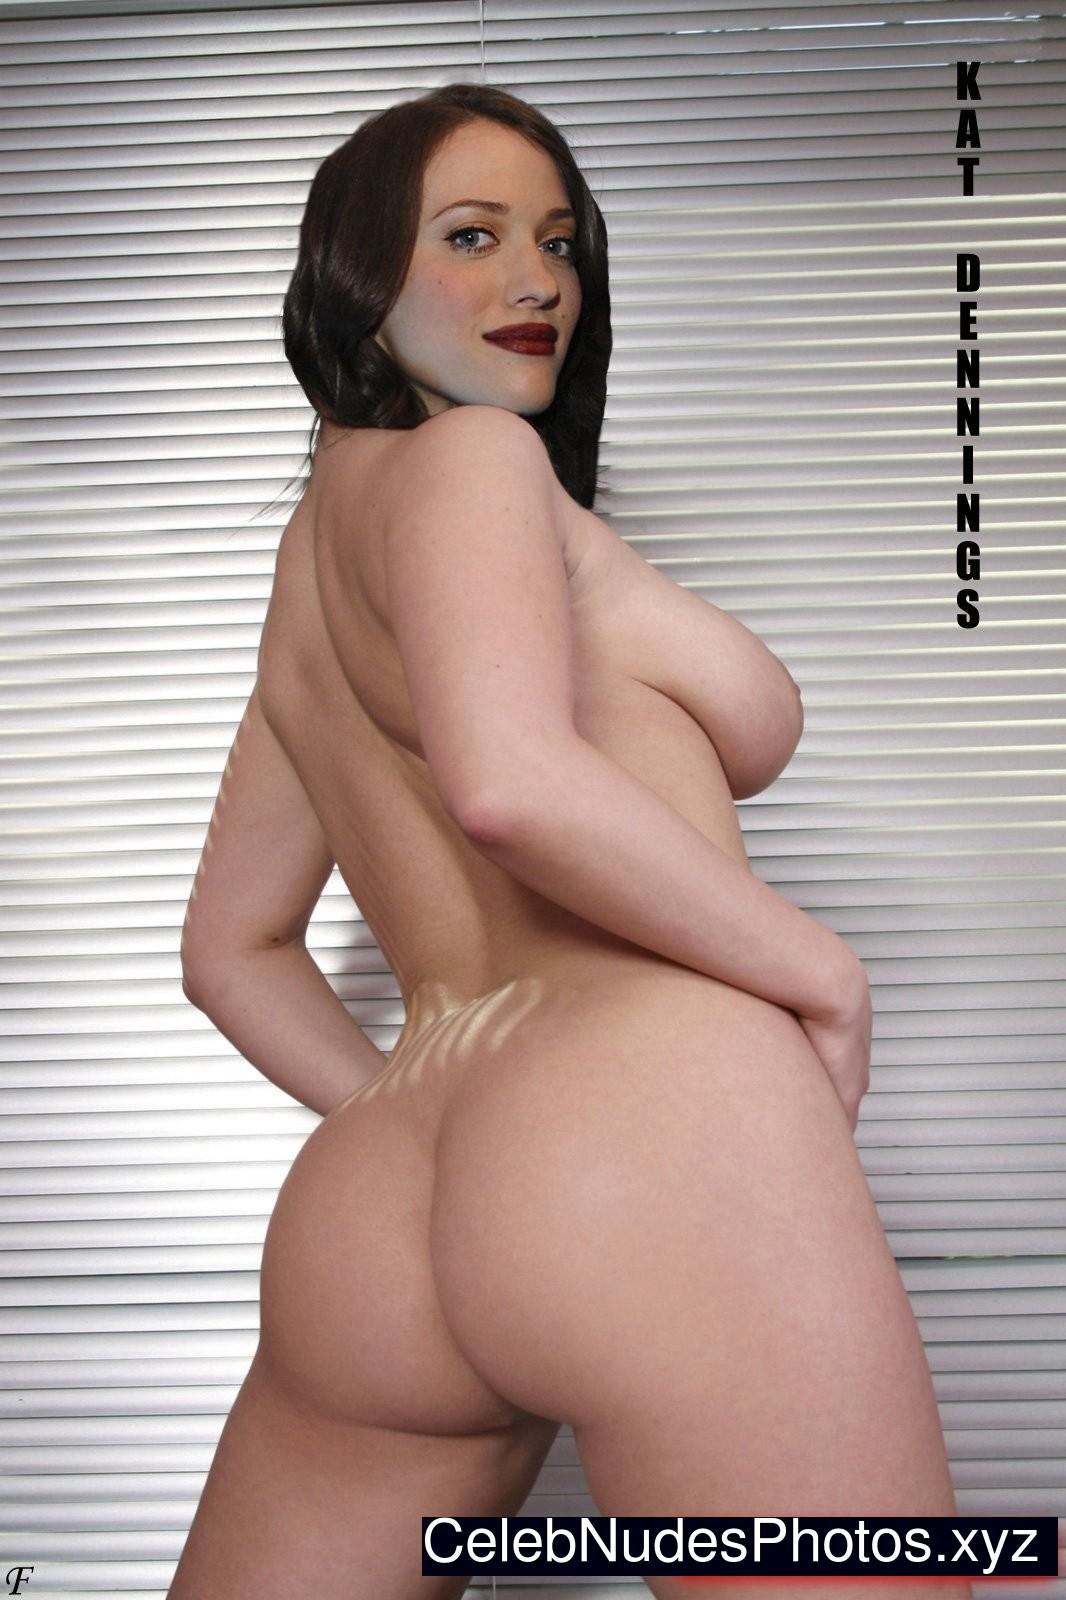 Beth Behrs Porno kat dennings nufe kat dennings naked pics scandalpost